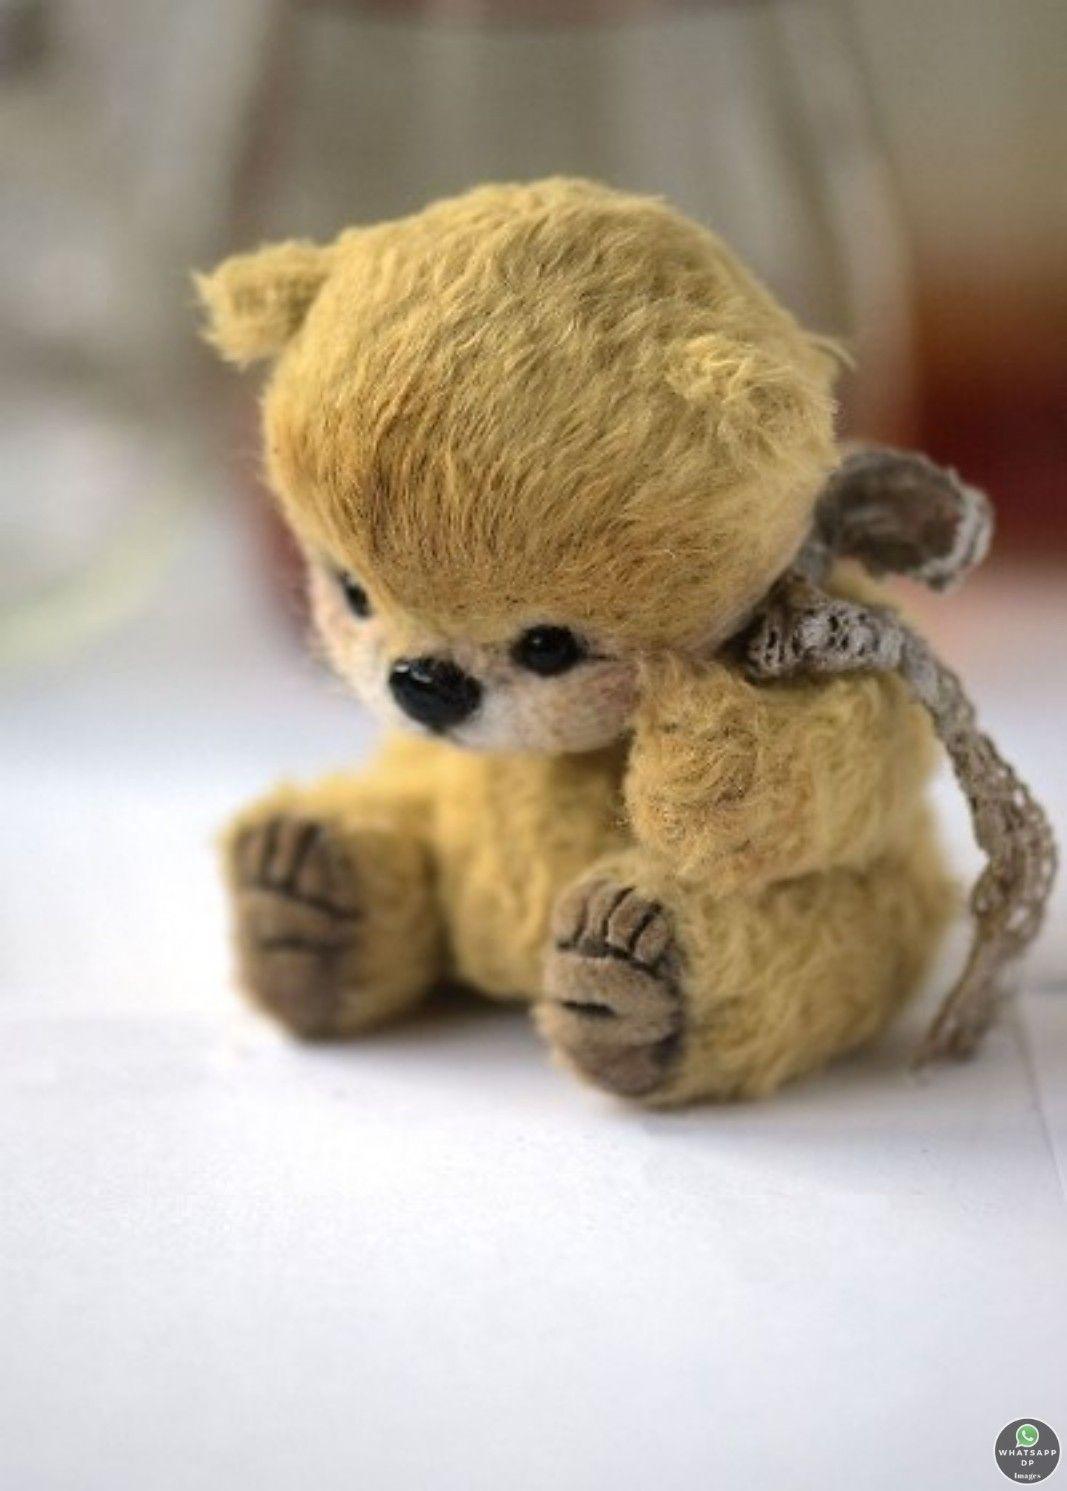 259+ Teddy Bear Images Download in 2020 Teddy bear